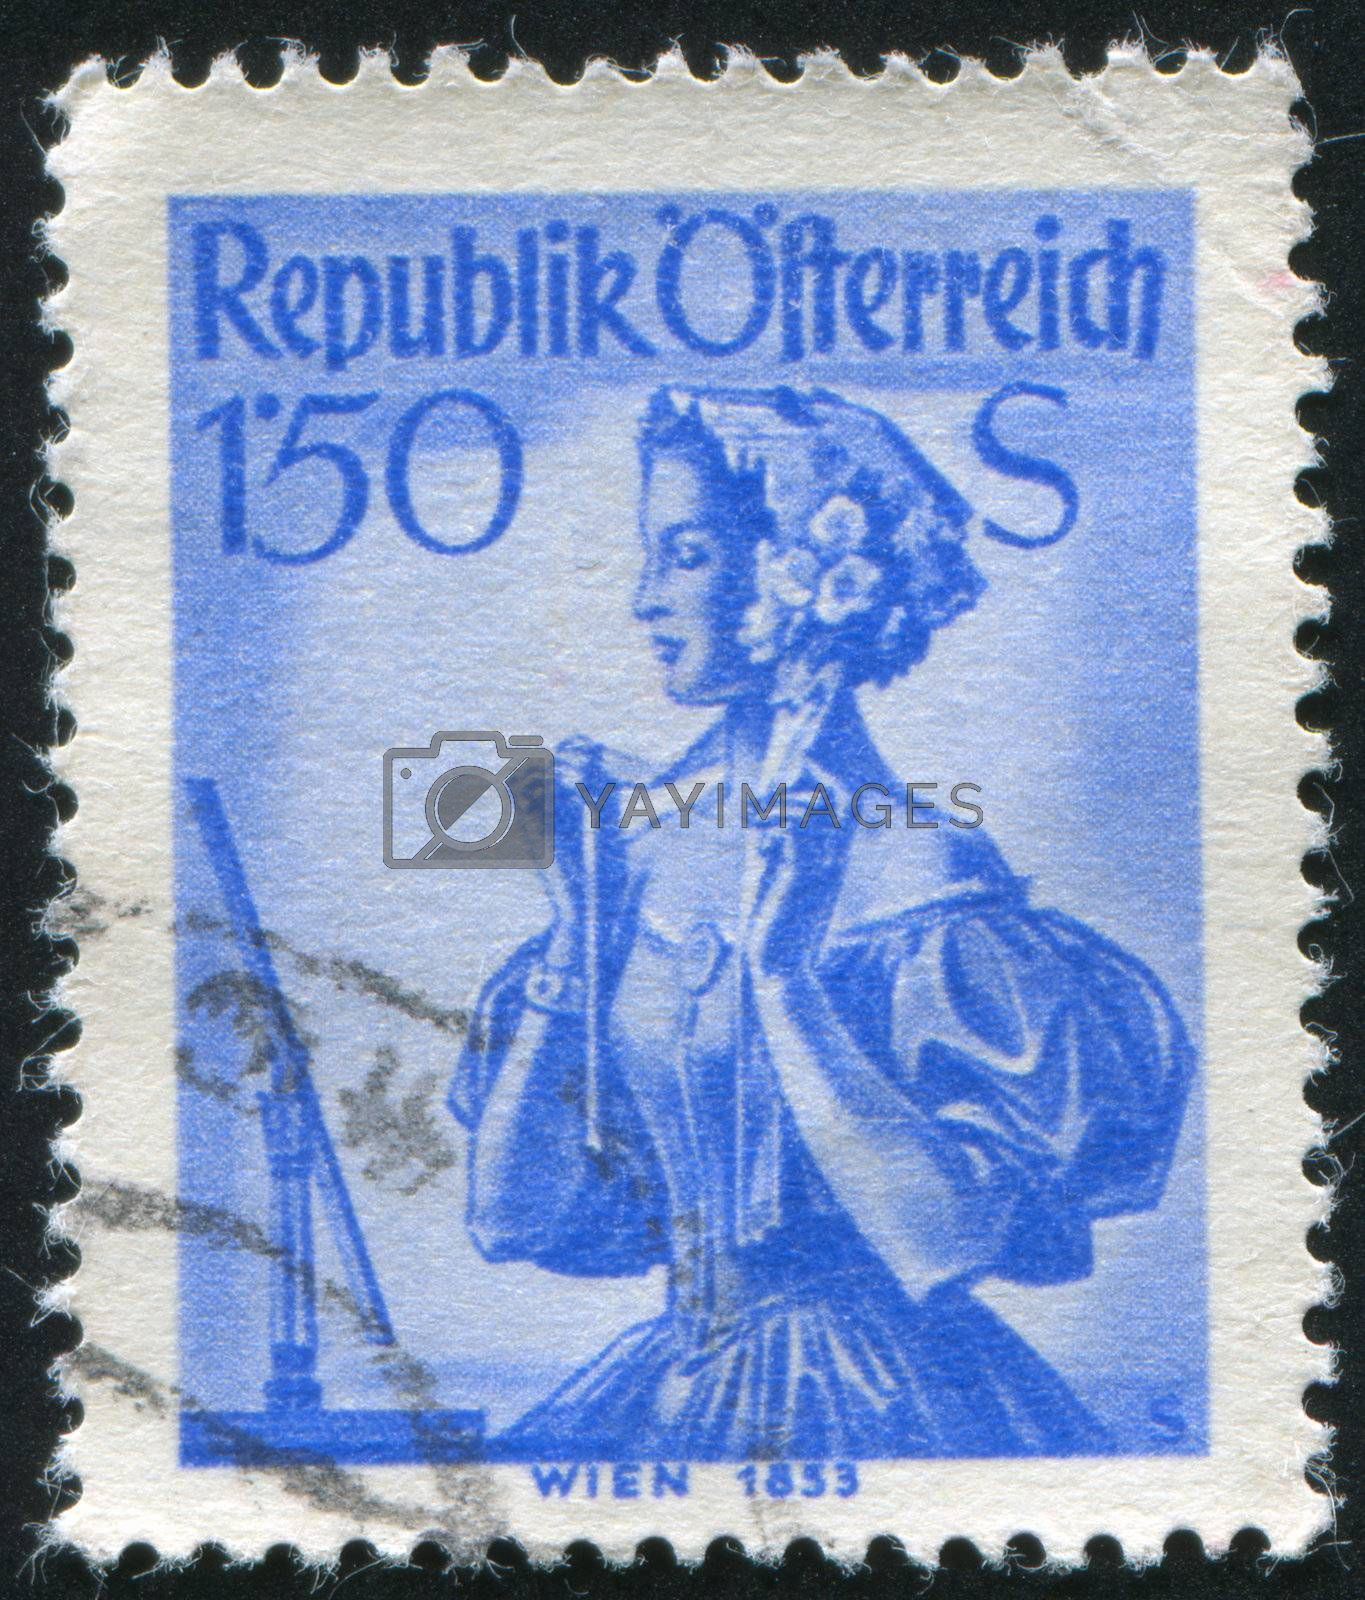 AUSTRIA - CIRCA 1948: stamp printed by Austria, shows Austrian Costumes, Vienna, circa 1948